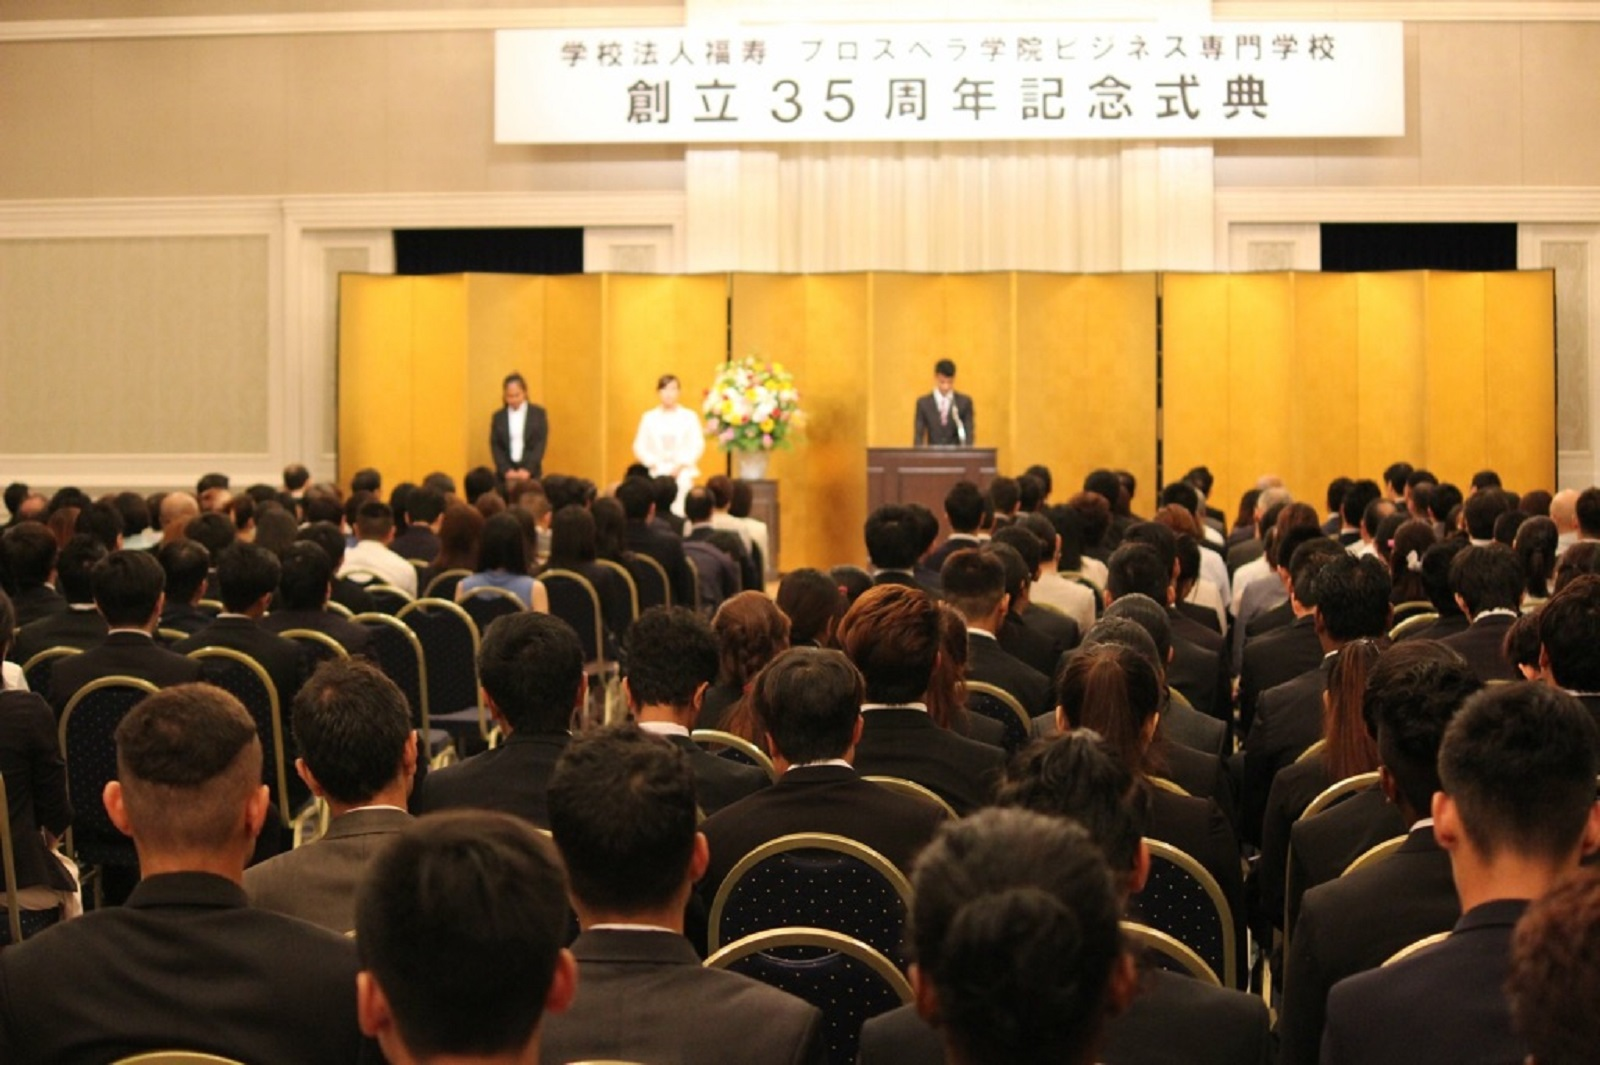 35th Anniversary Ceremony